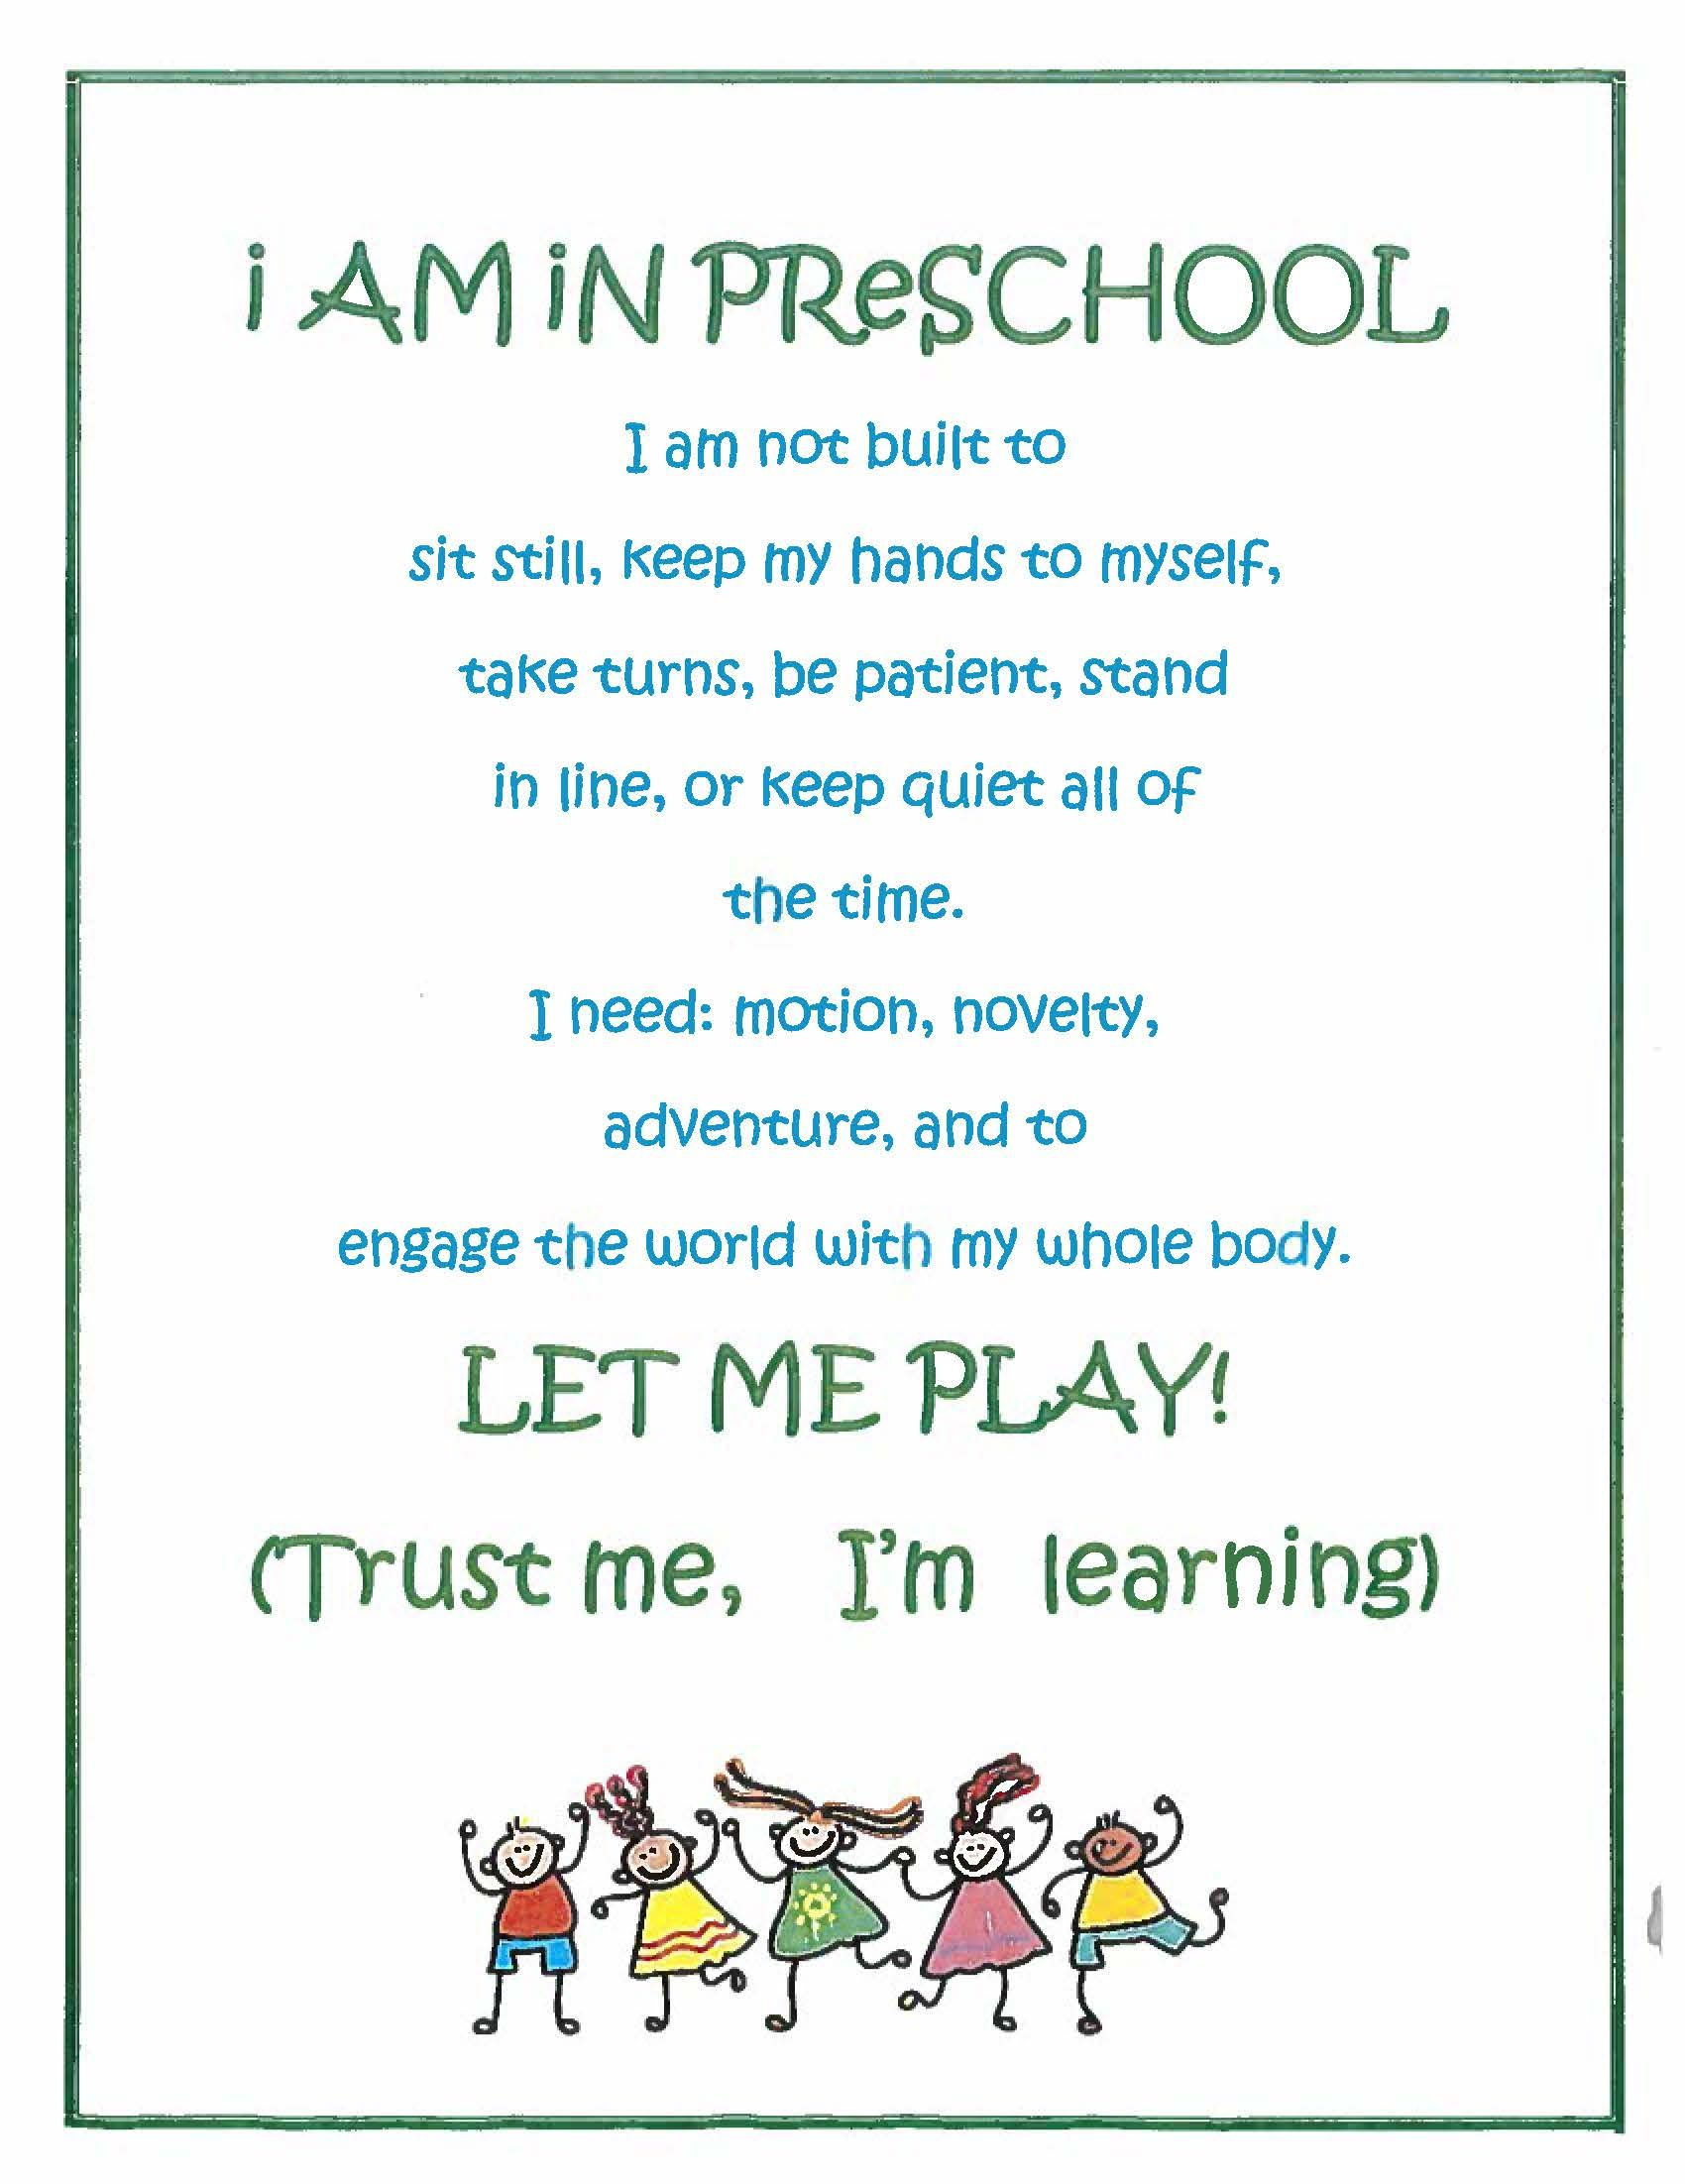 Inspirational Quotes For Preschoolers